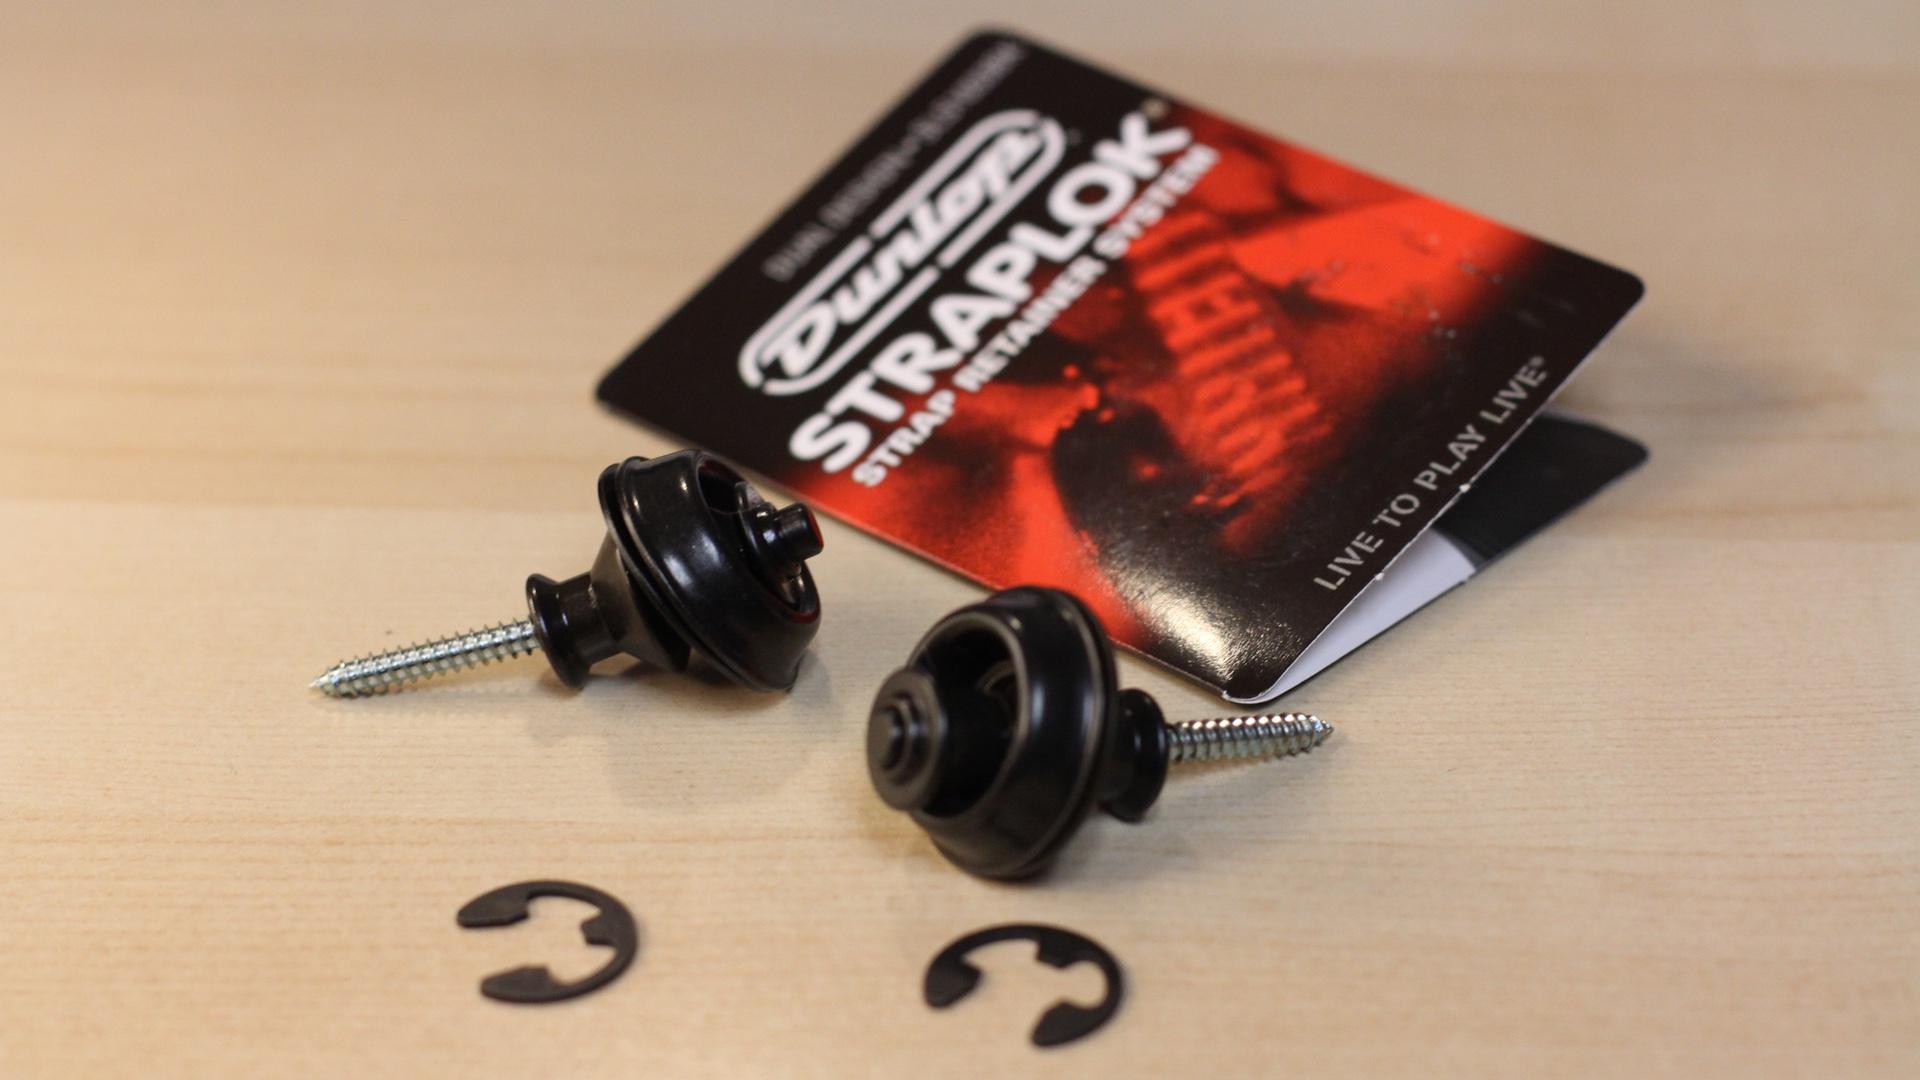 Dunlop Straplok Balck Hardware